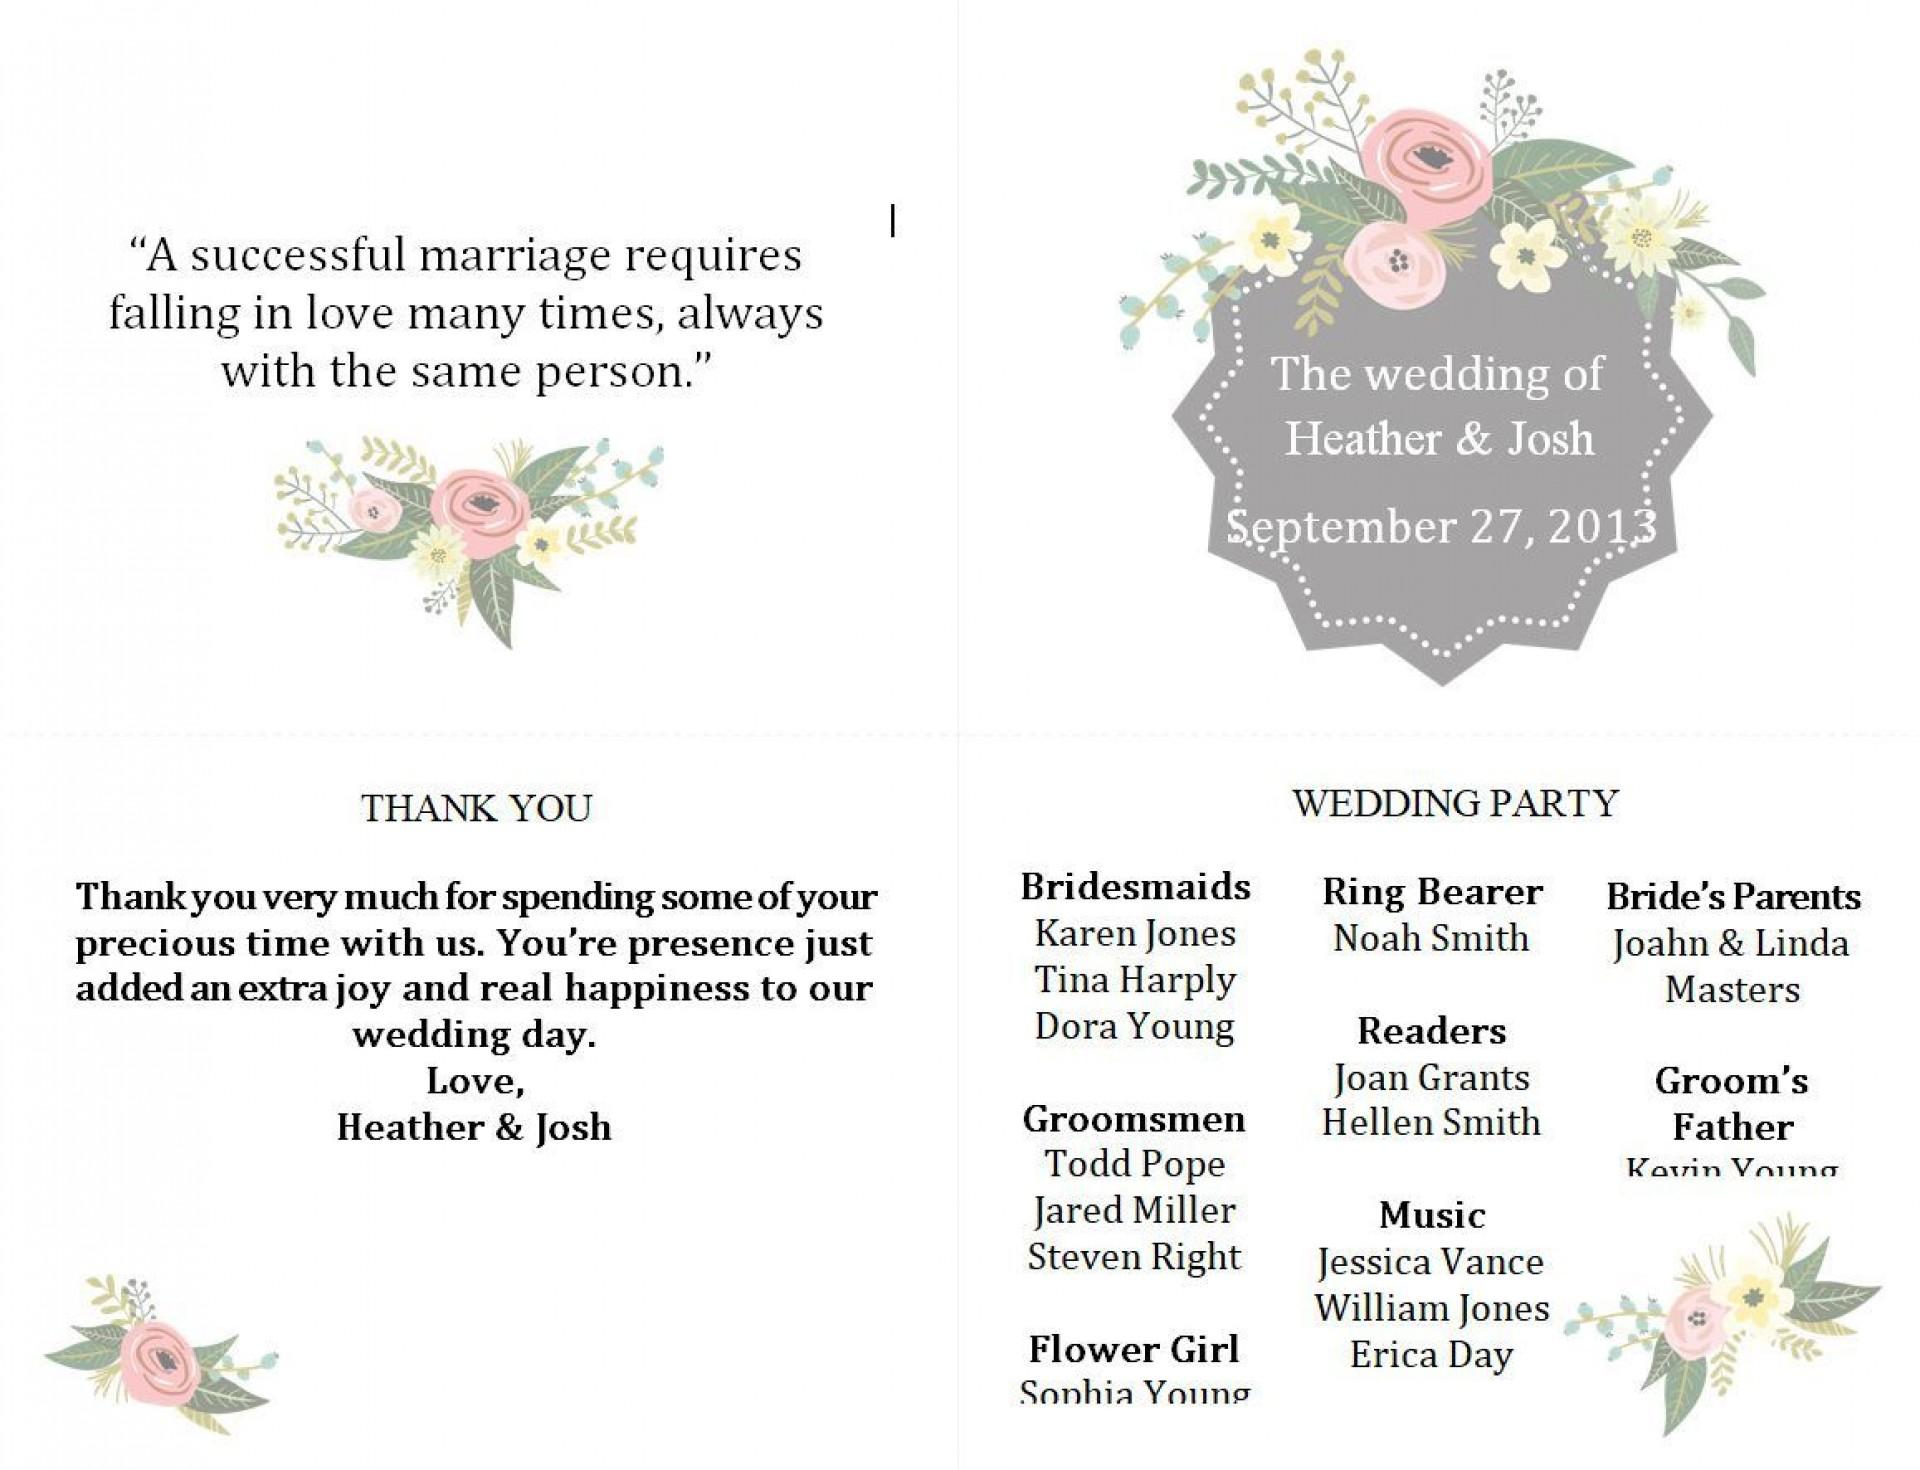 005 Surprising Free Wedding Program Template Photo  Templates Pdf Download Fan Word1920